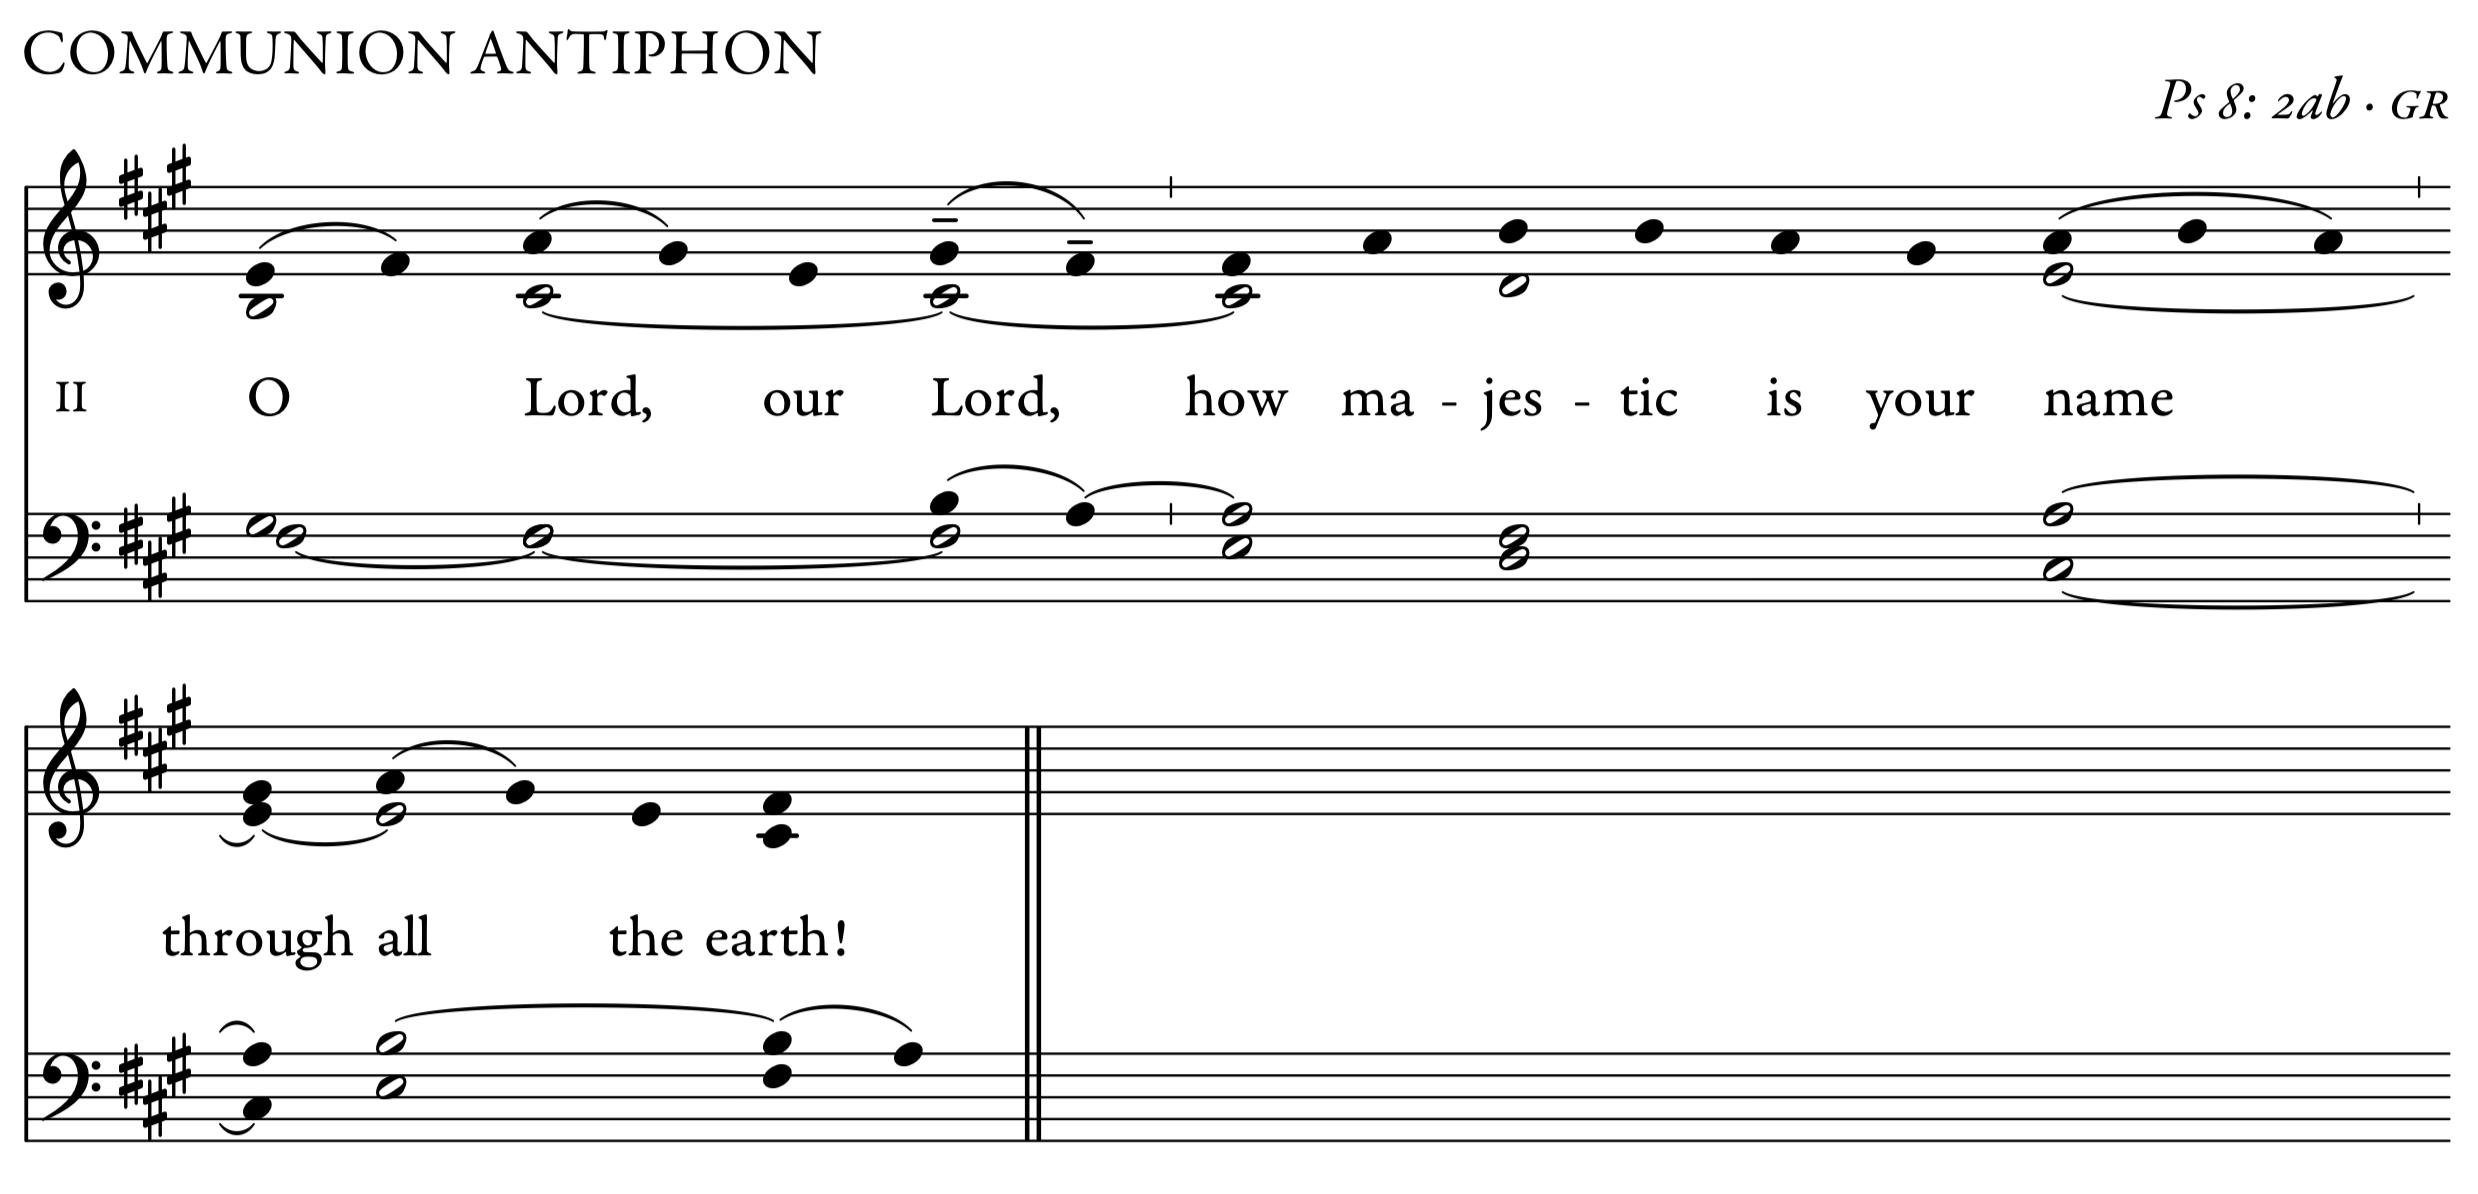 Communion Antiphon